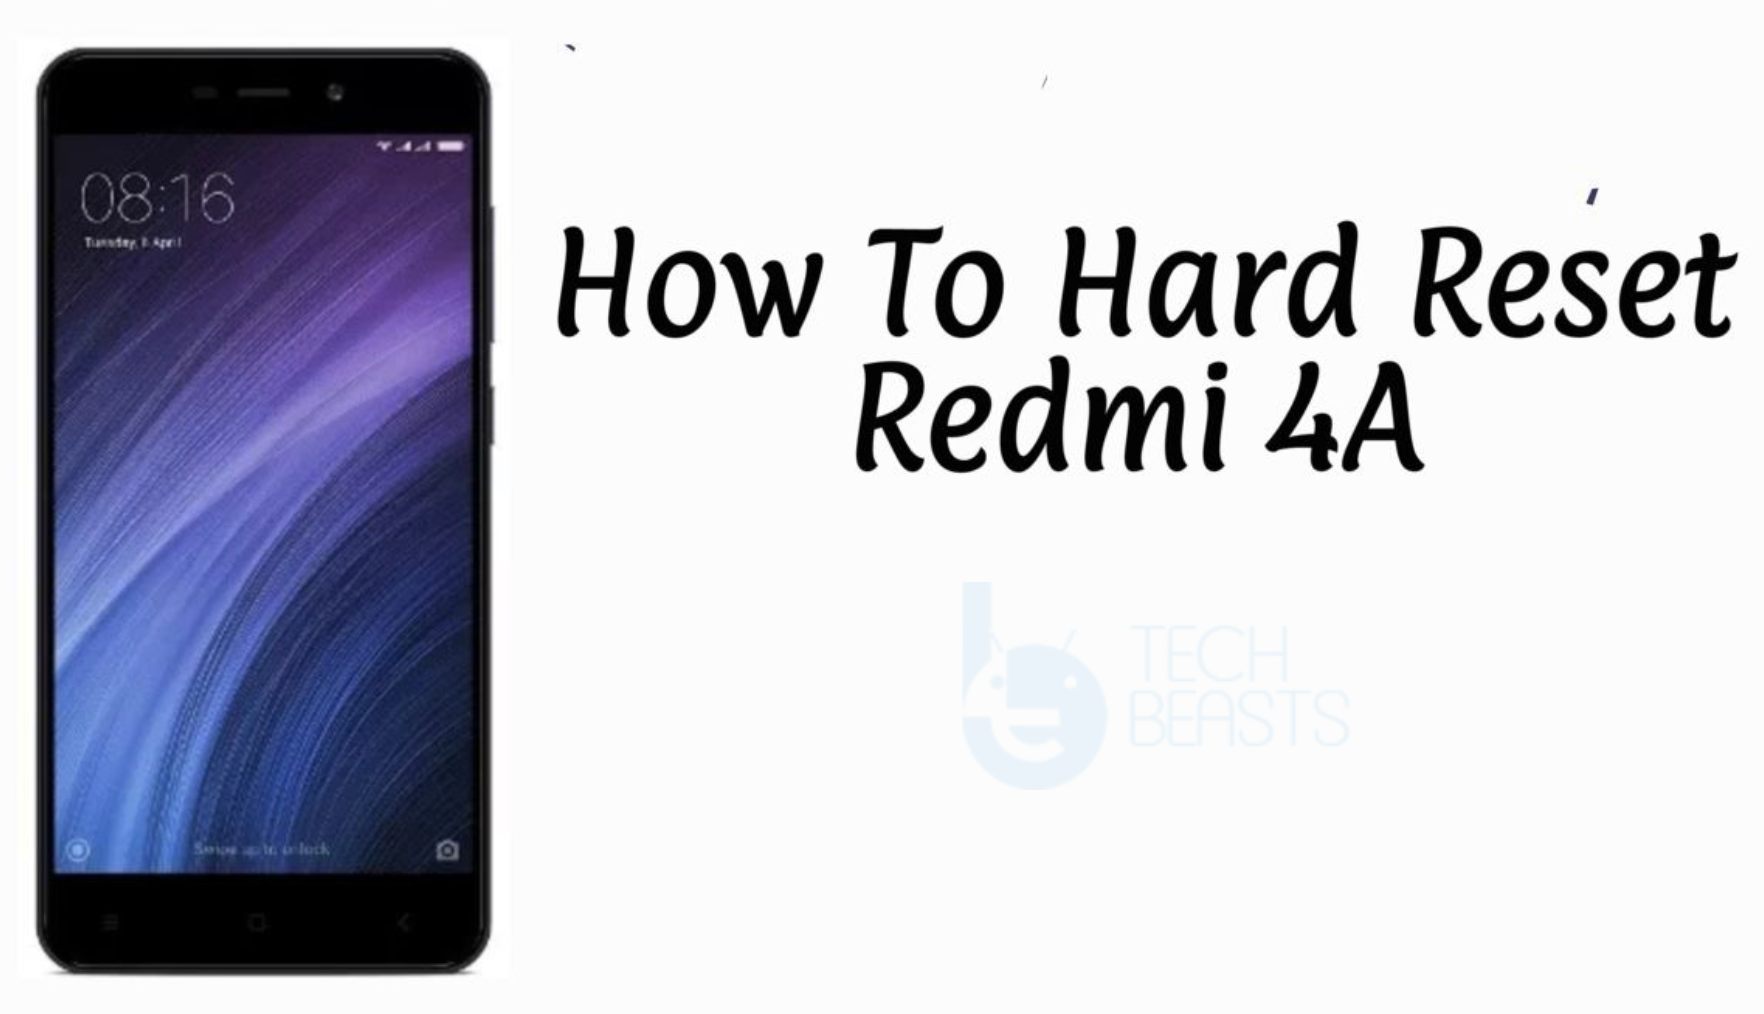 Hard Reset Xiaomi Redmi 4A